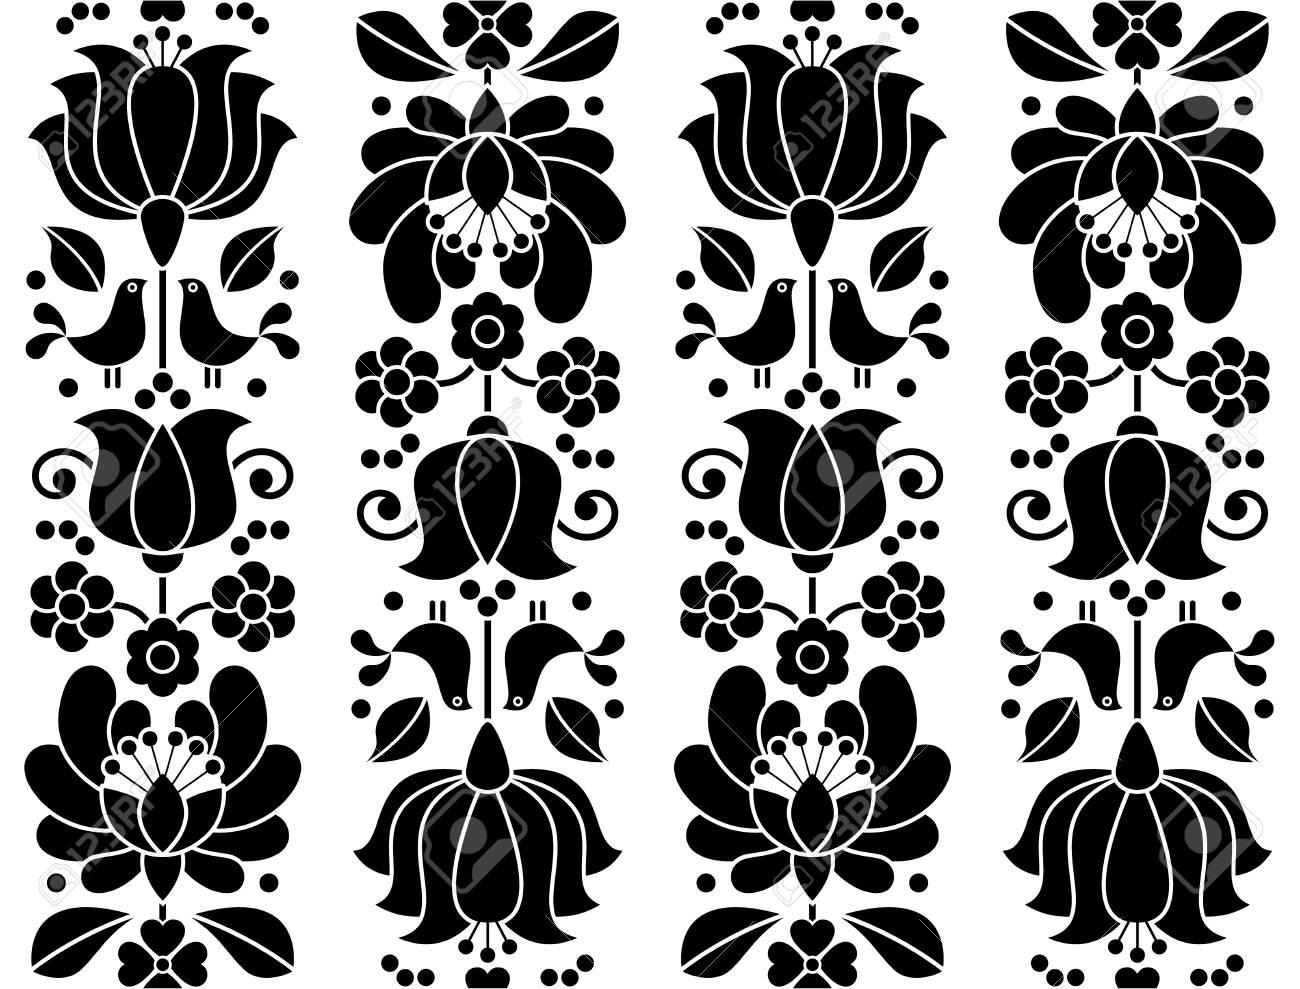 Patrón Floral Transparente - Bordados Kalocsai - Diseño Popular ...